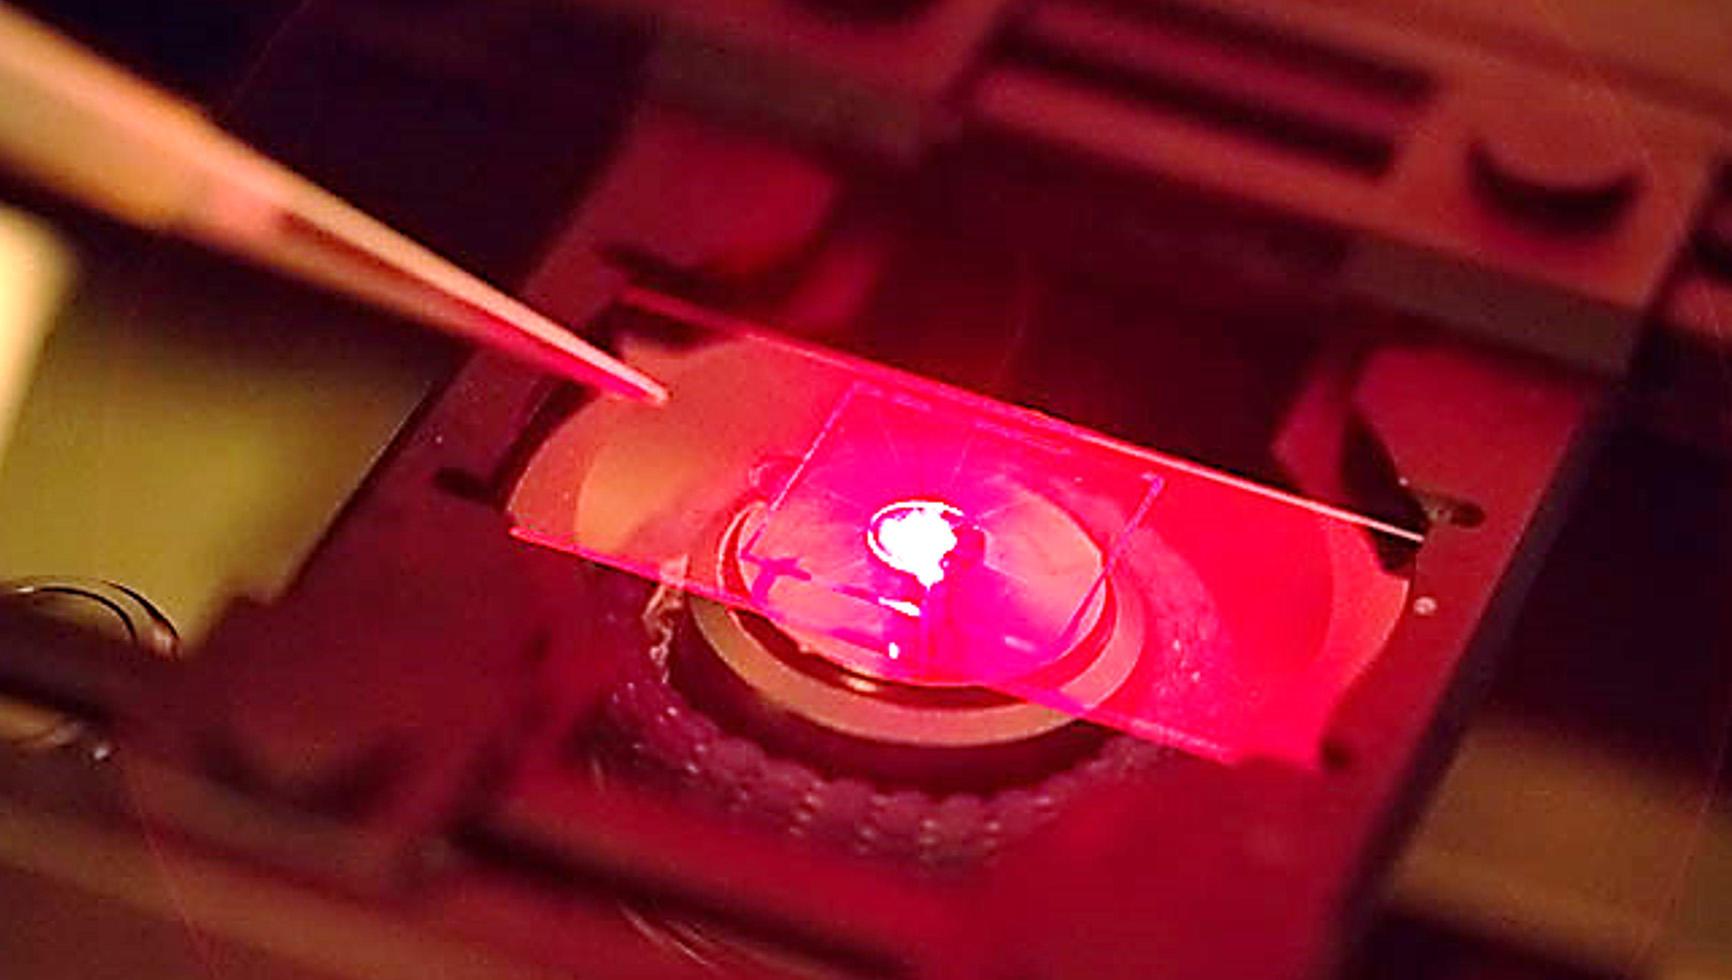 Near-infrared imaging for deep-tissue microscopy of brain chemistry